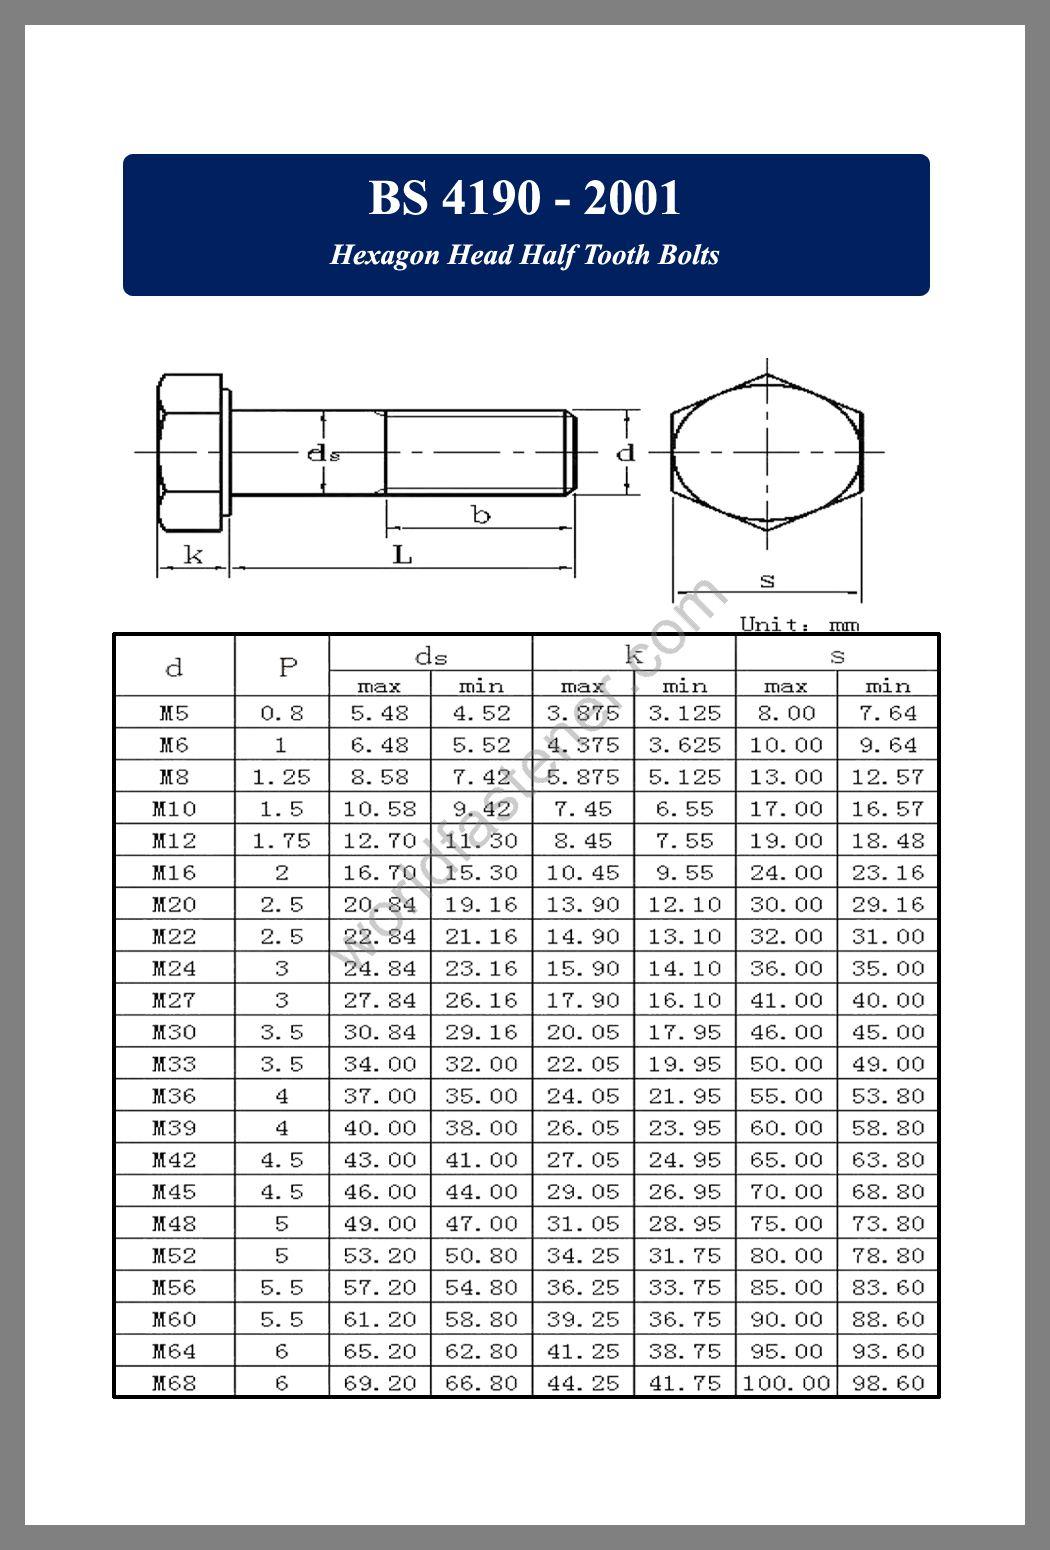 BS 4190, BS 4190 Hexagon Head Half Tooth Bolts, fastener, screw, bolt, BS Bolt, BS fastener